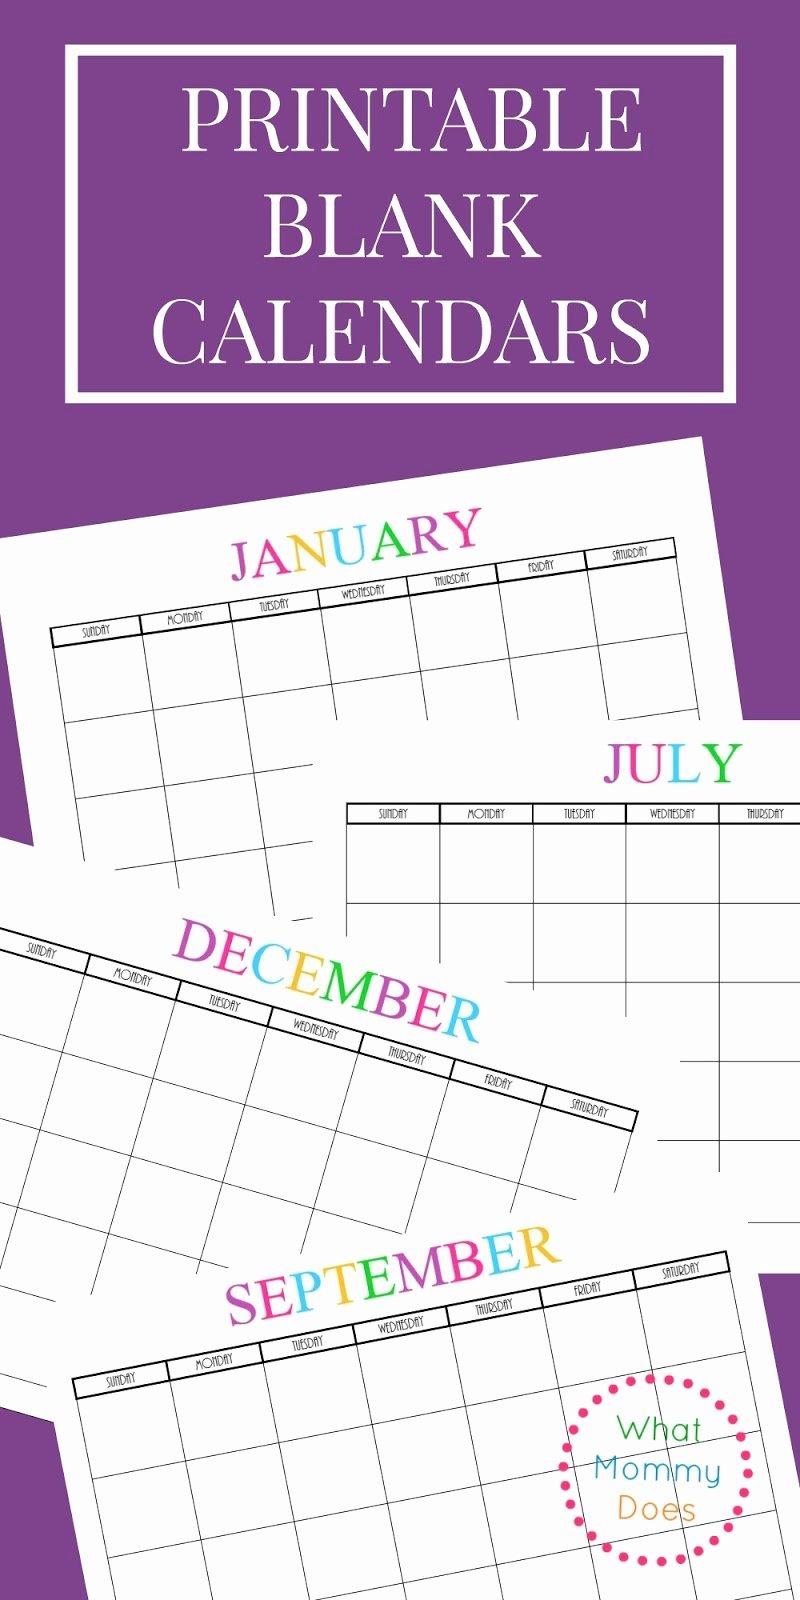 Musings Of An Average Mom Free Printable Blank Calendars